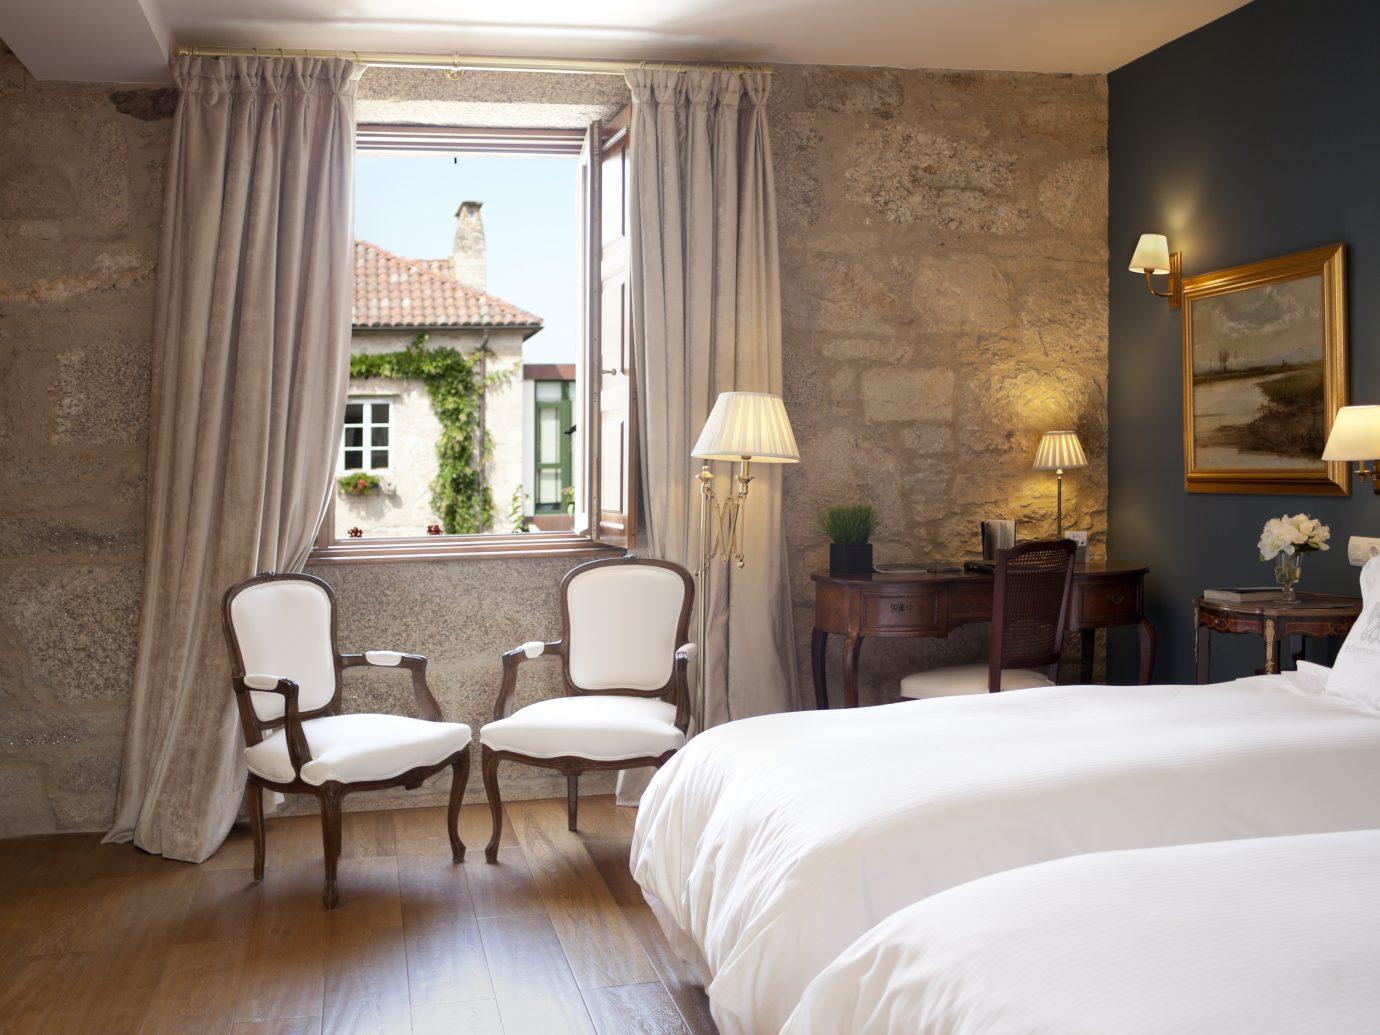 Guestroom at the Hotel Spa Relais & Chateaux A Quinta da Auga, Santiago de Compostela, Spain